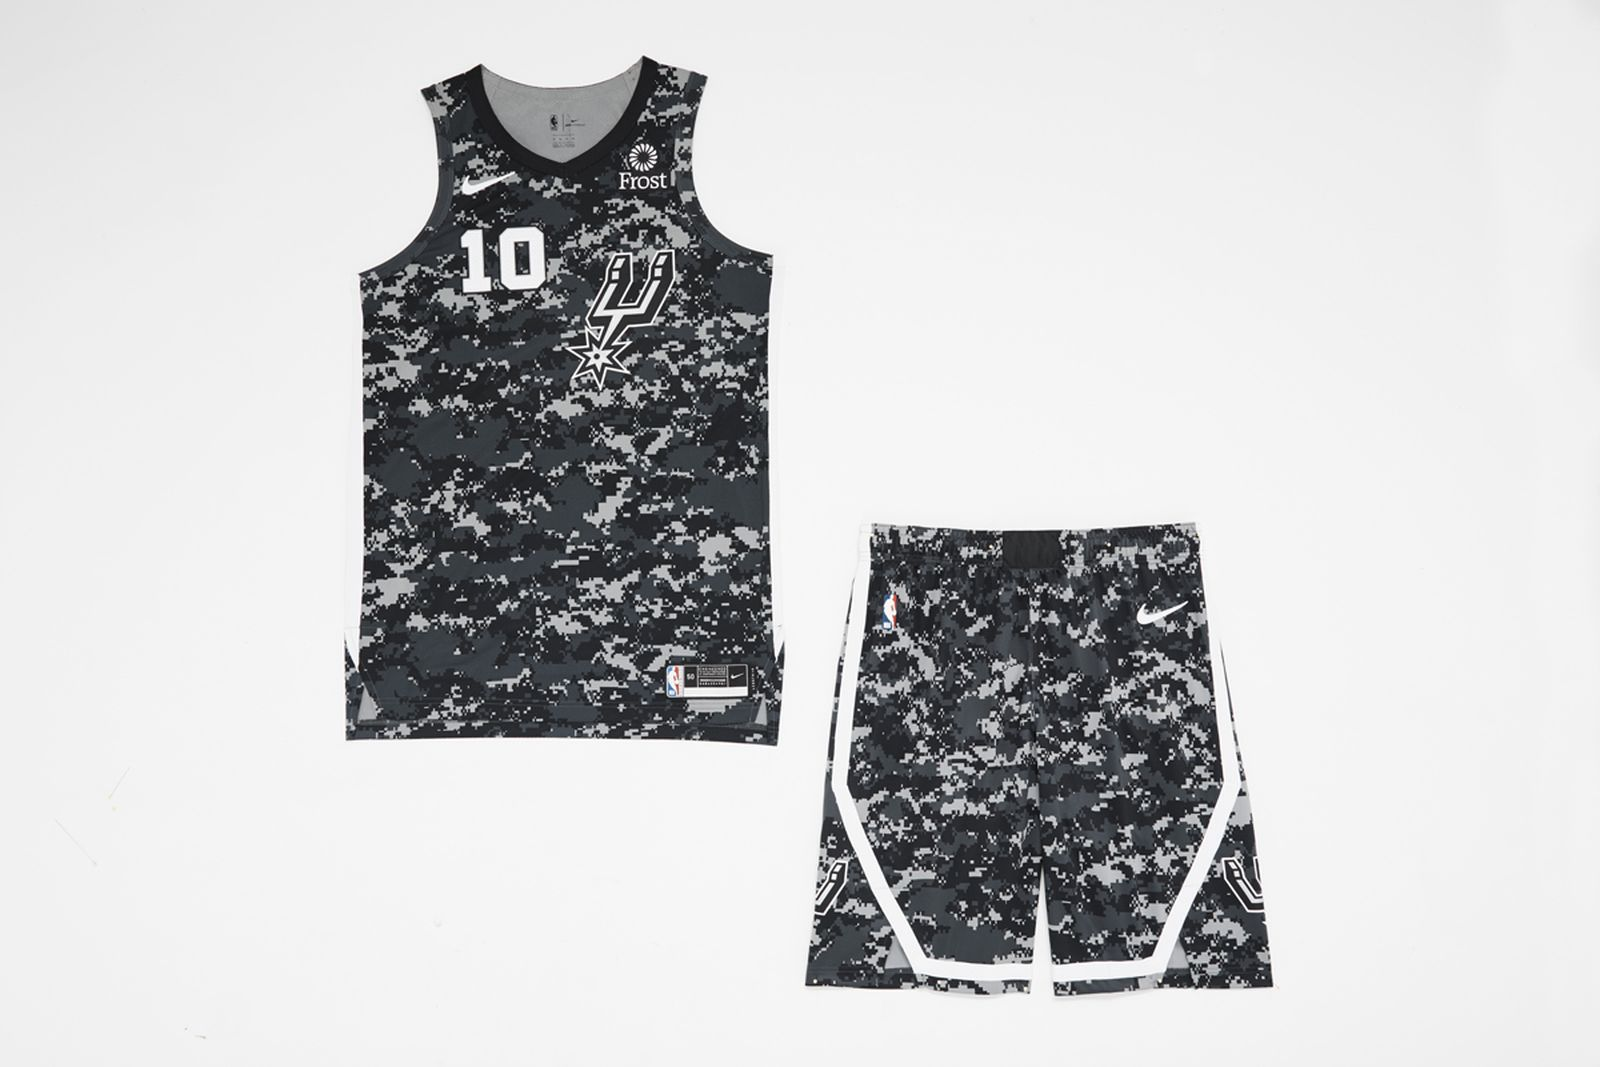 Nike NBA City Edition Uniforms